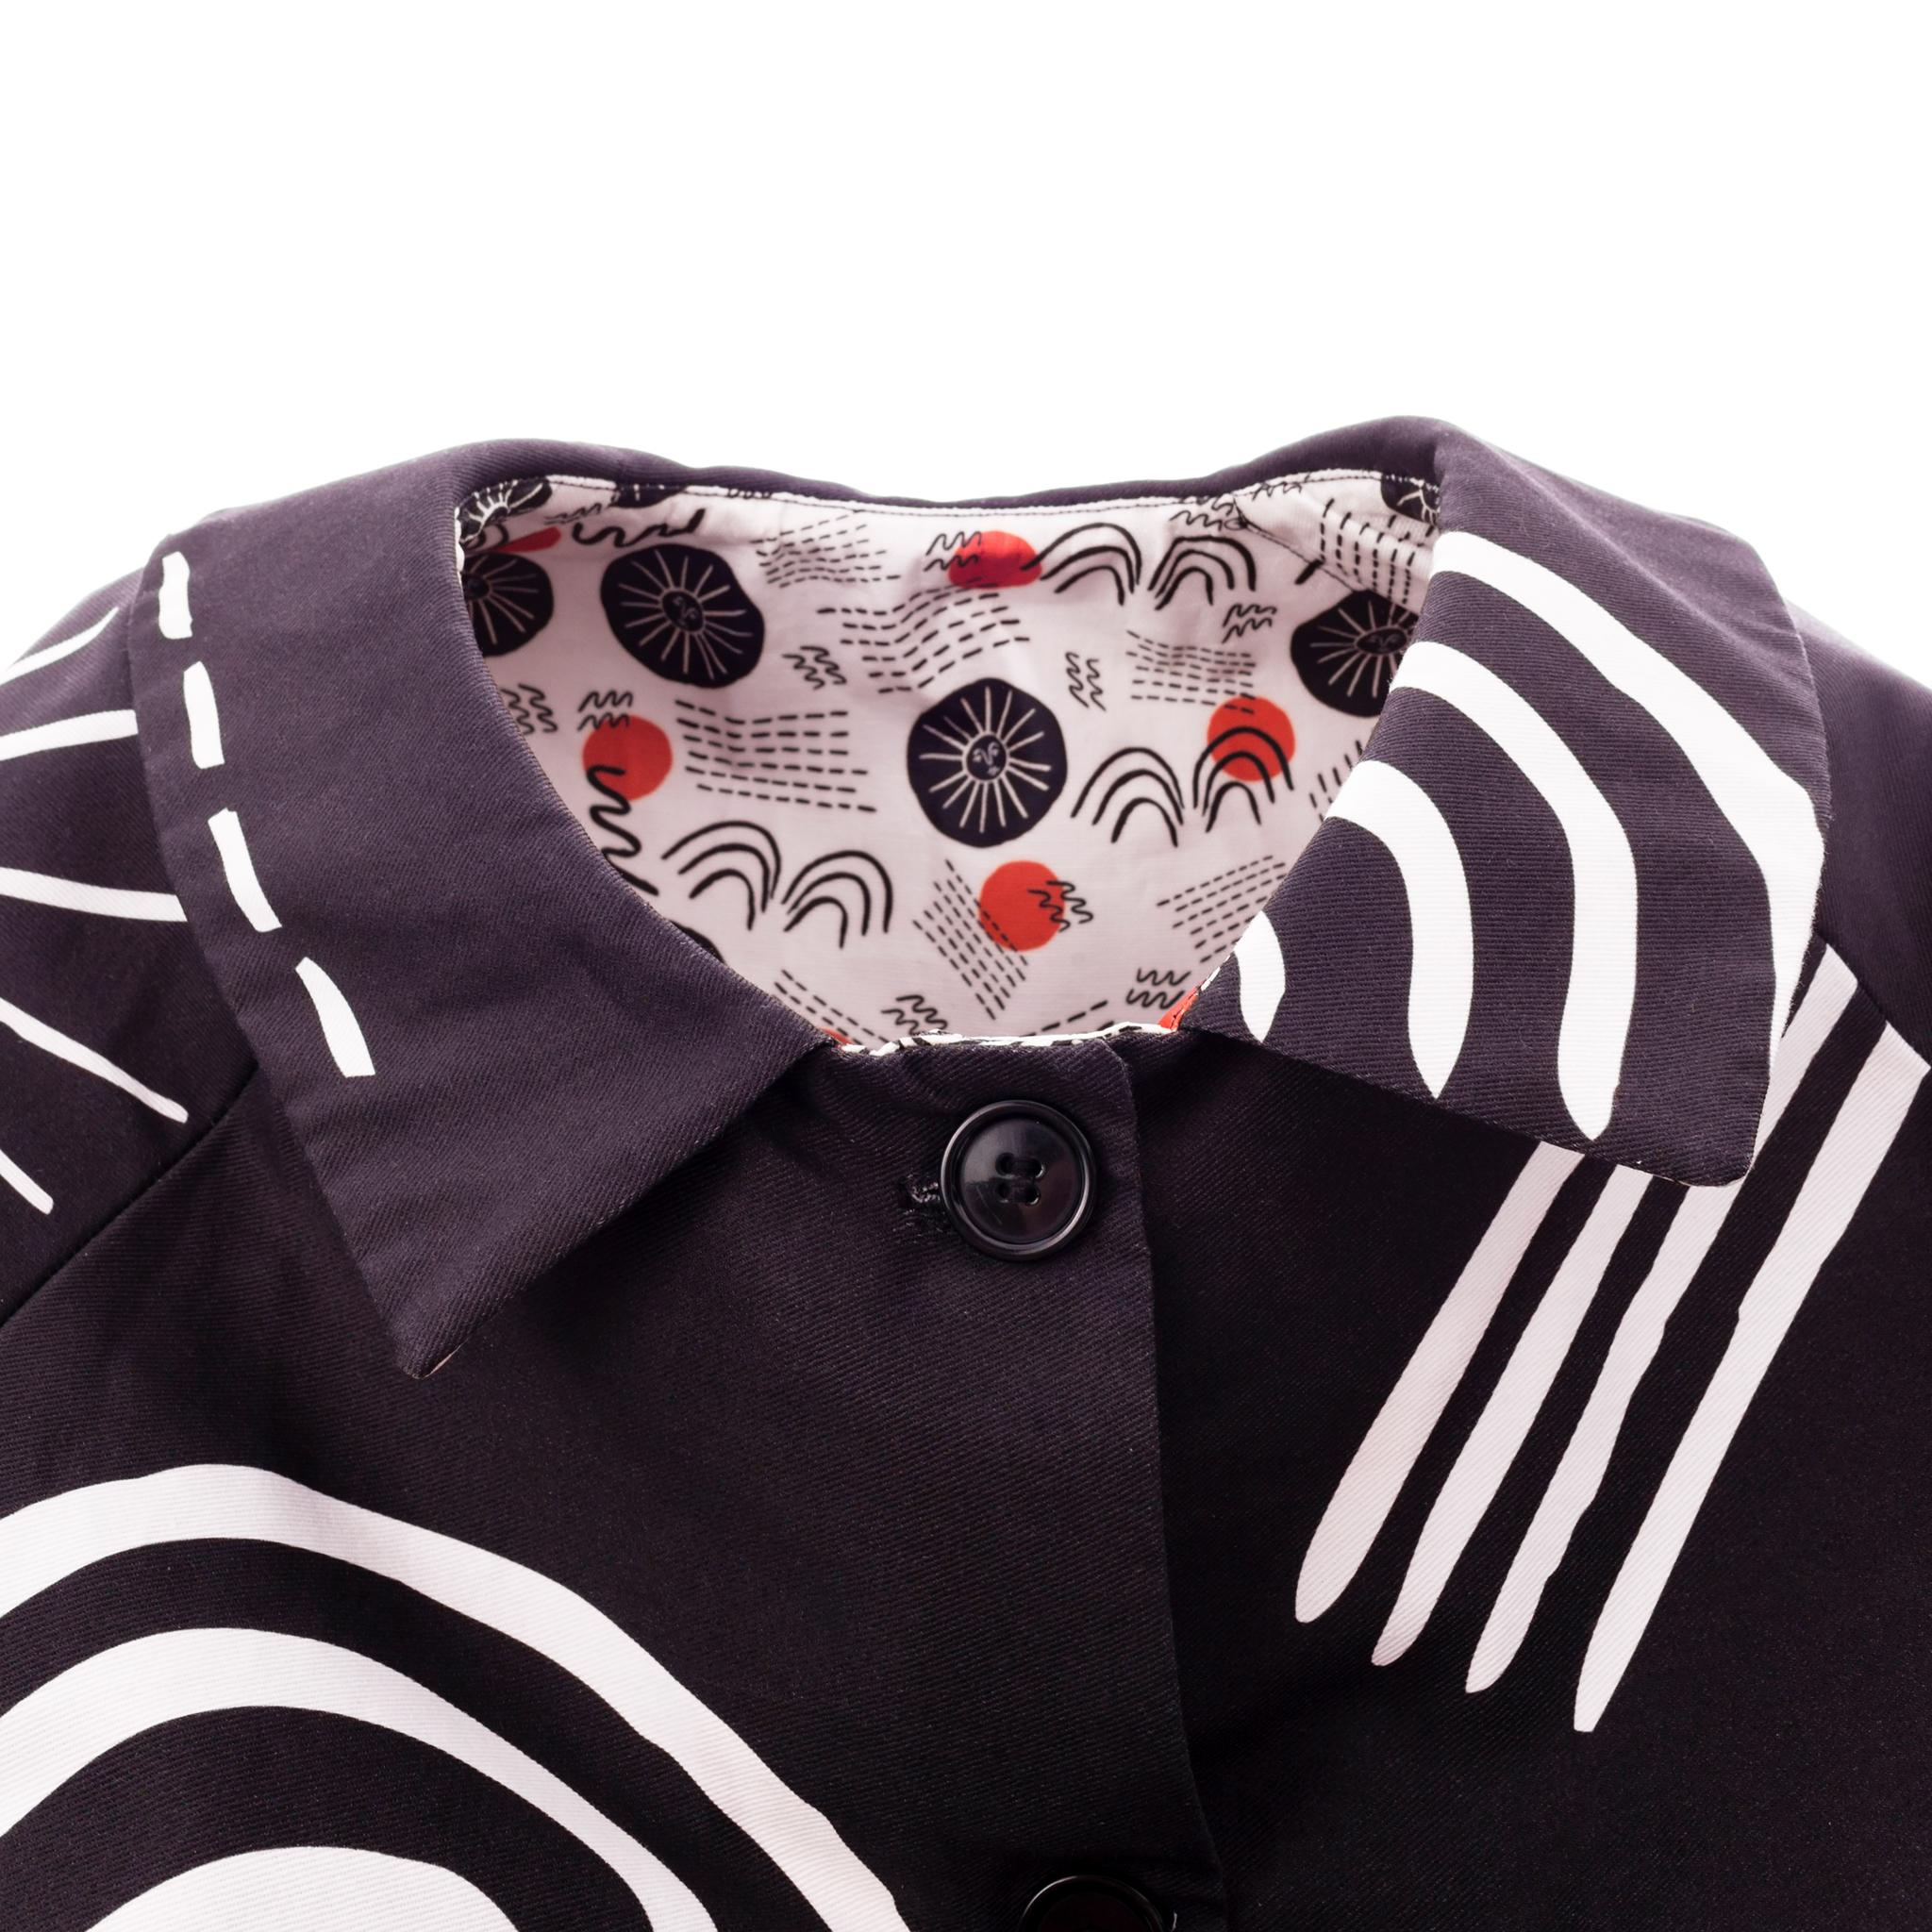 The Glasgow Raincoat (detail)